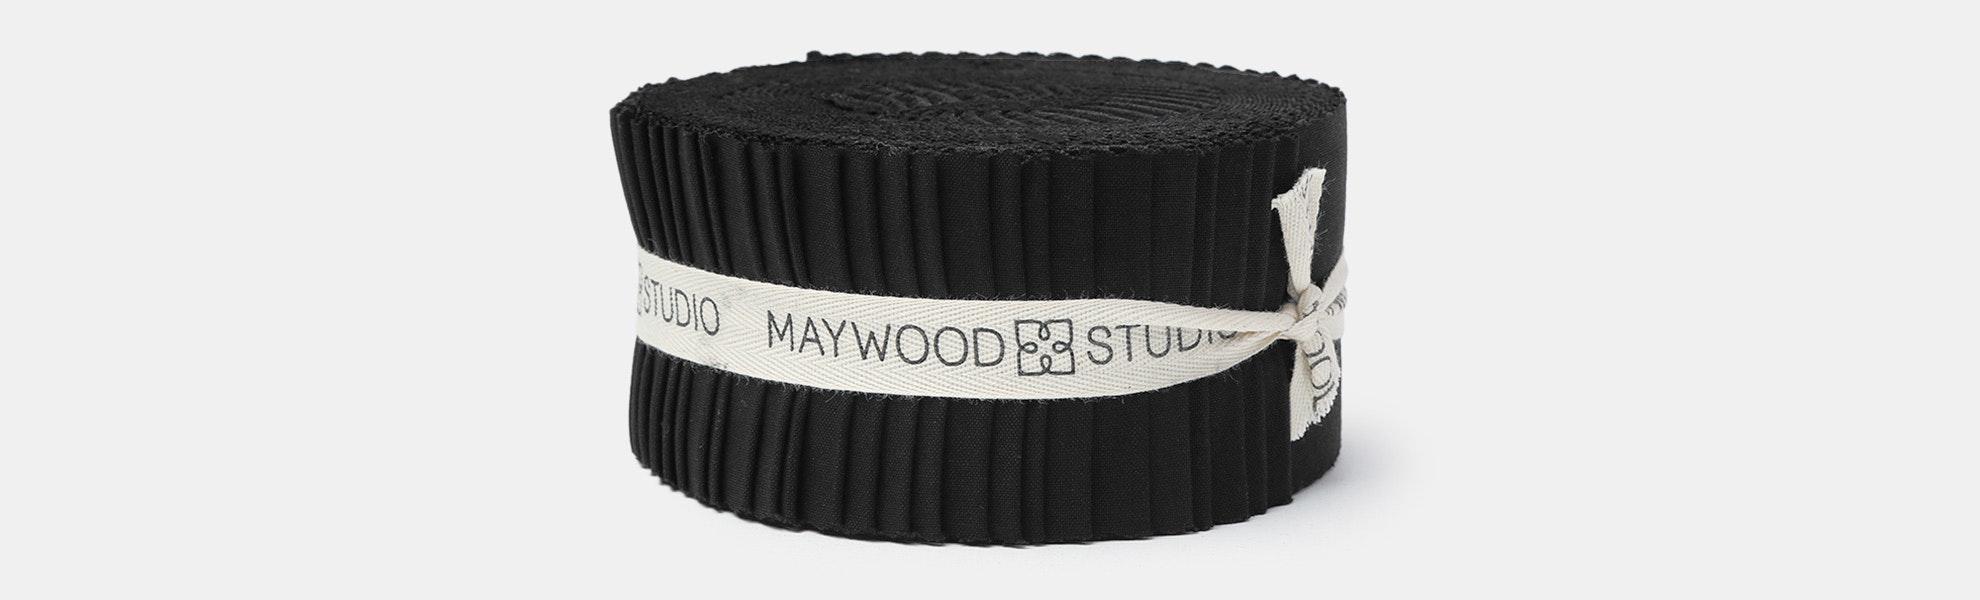 Strips by Maywood Studio